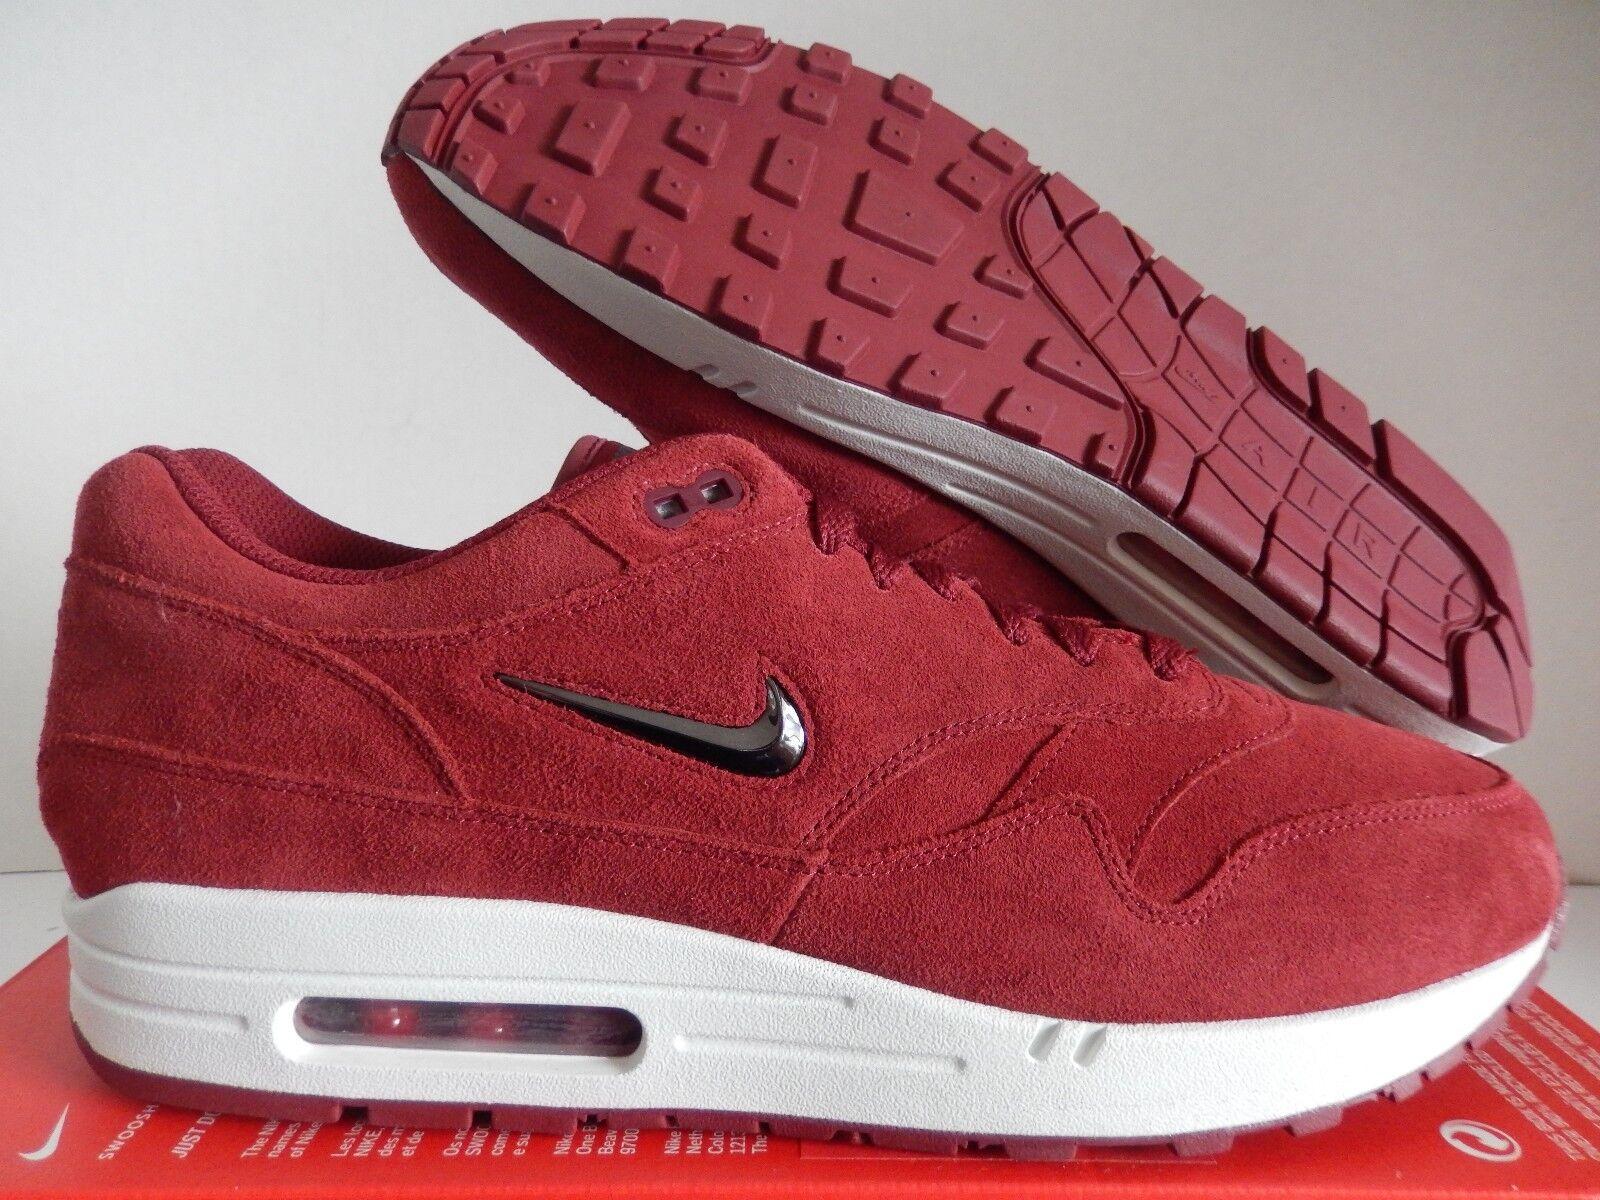 Nike Air Max 1 Jewel Red Suede 918354 600